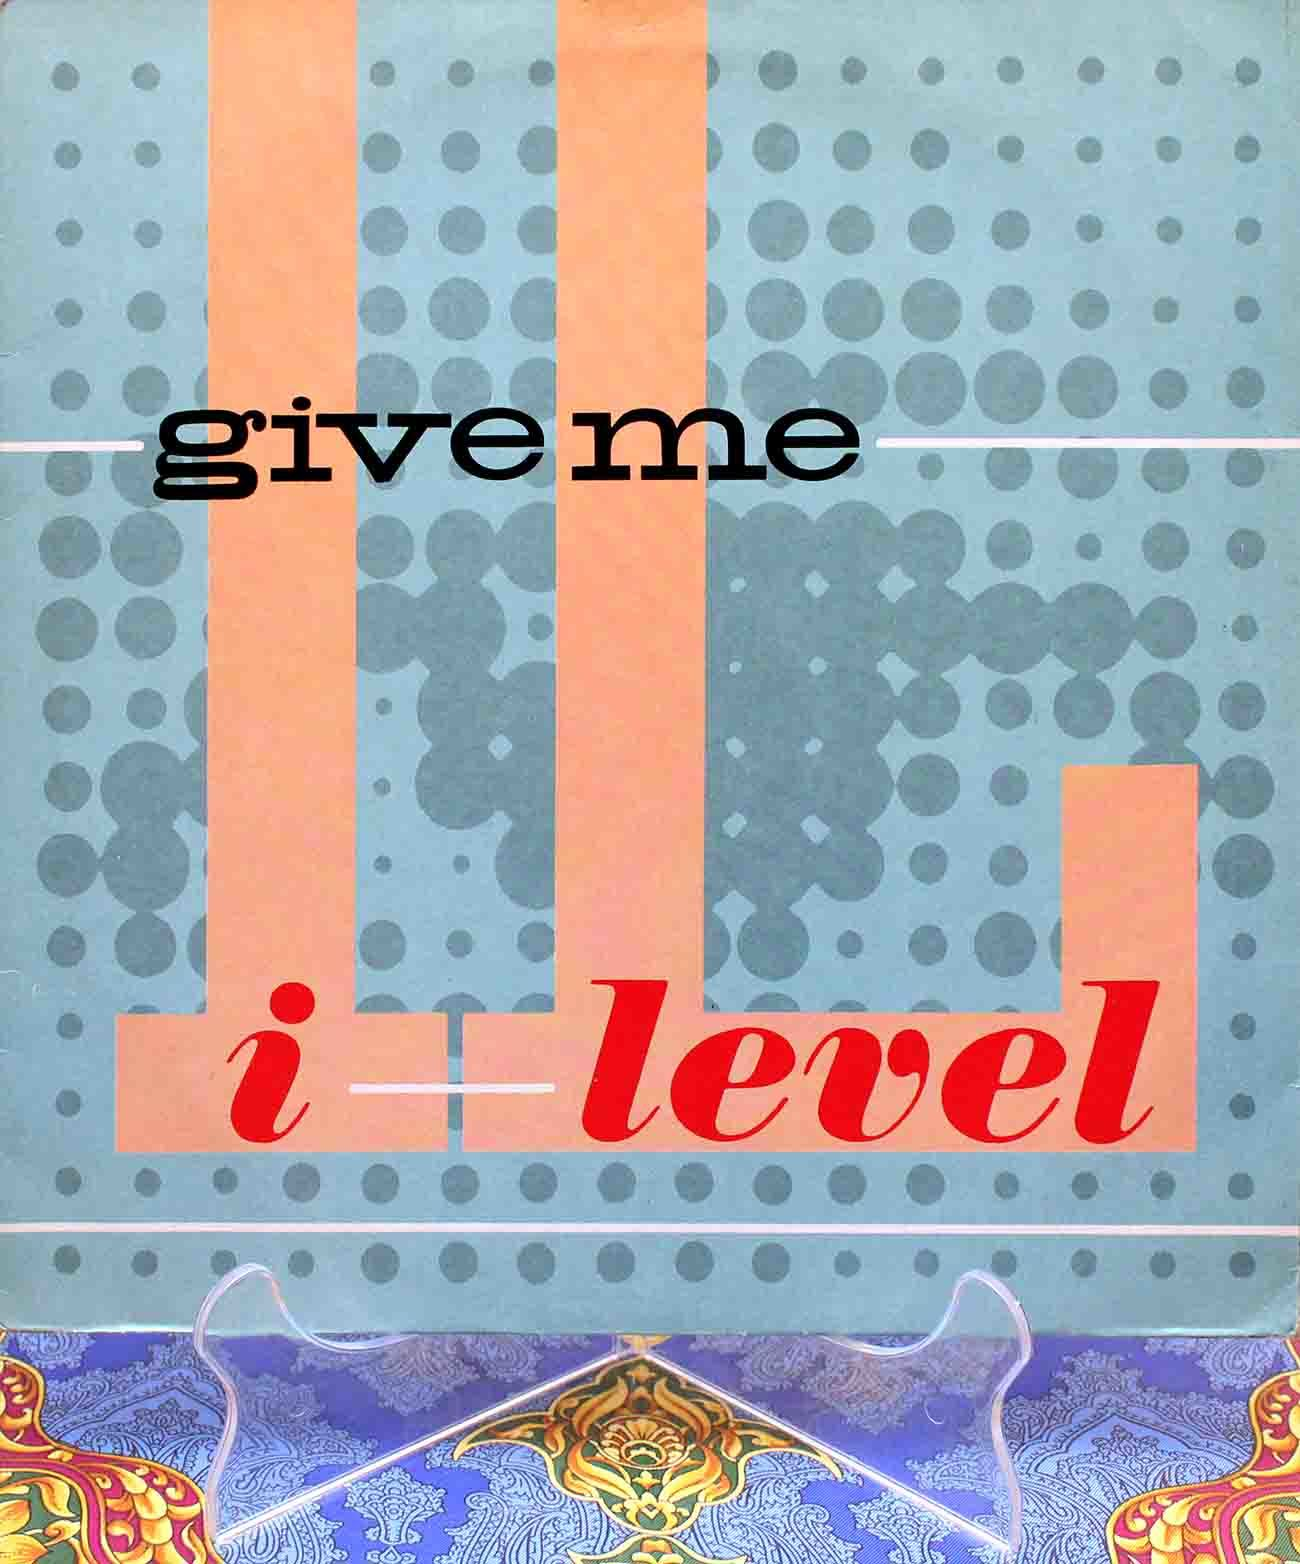 I-Level - Give Me 01